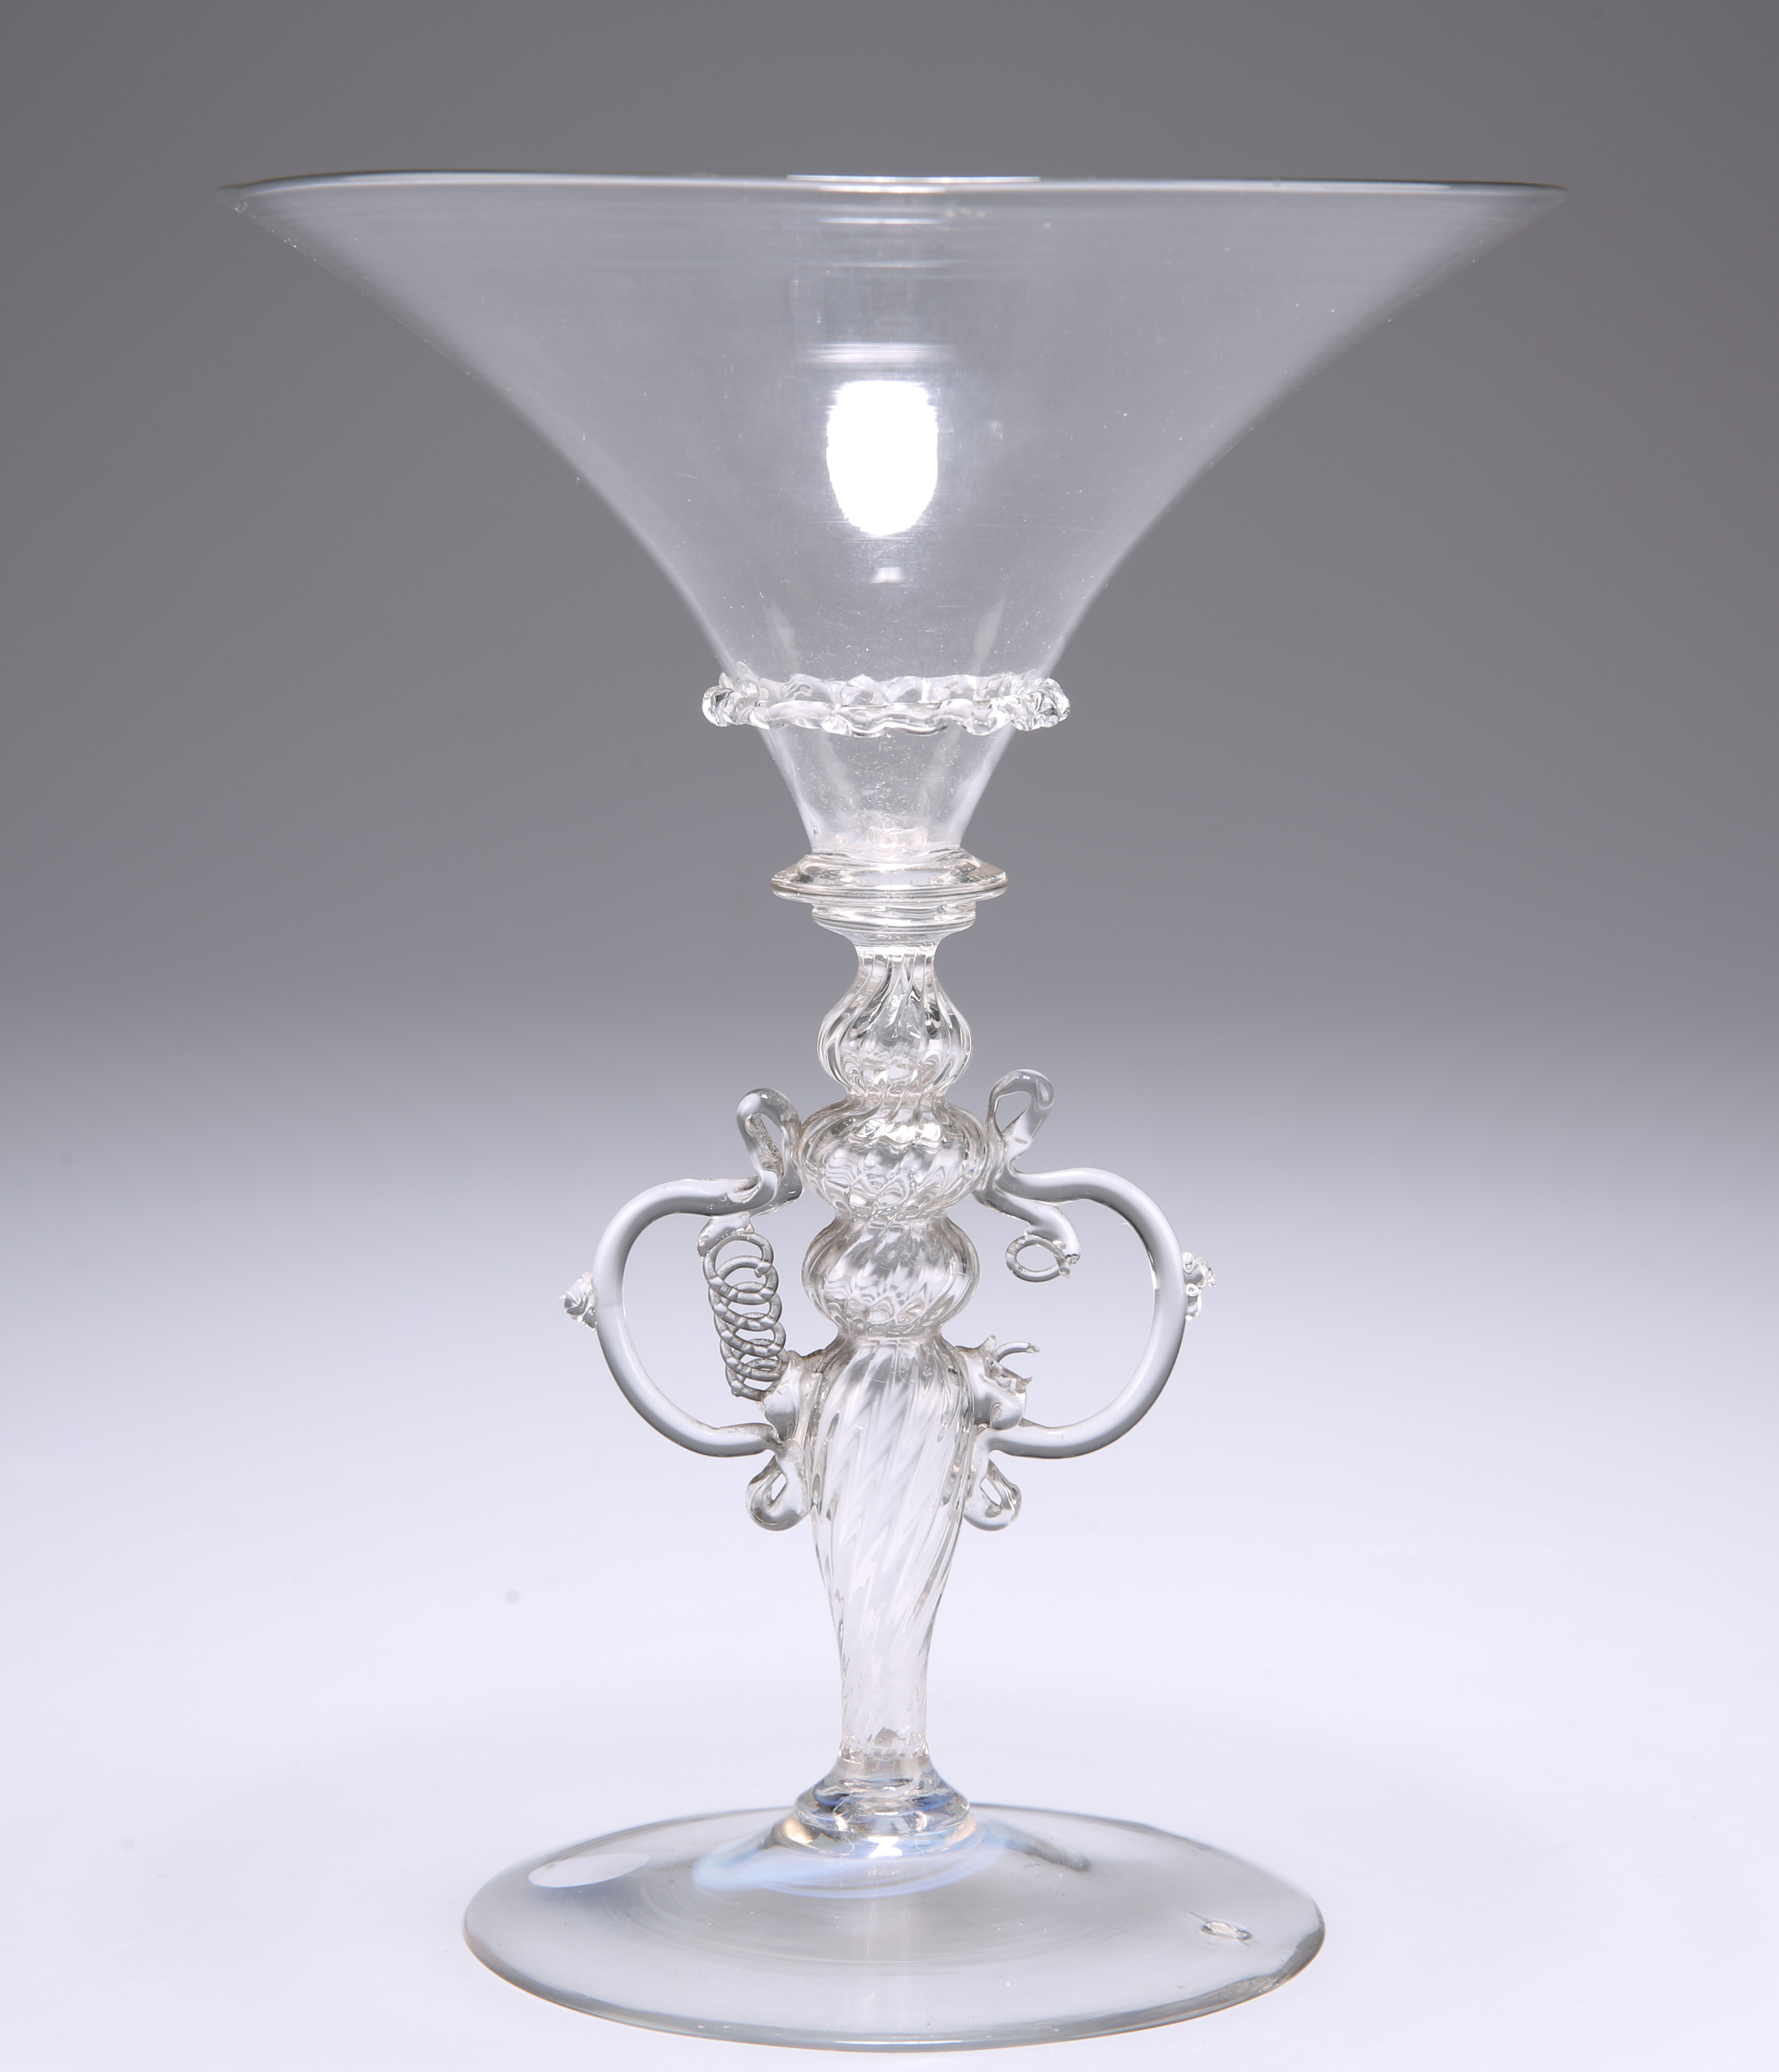 A VENETIAN WINGED WINE GLASS